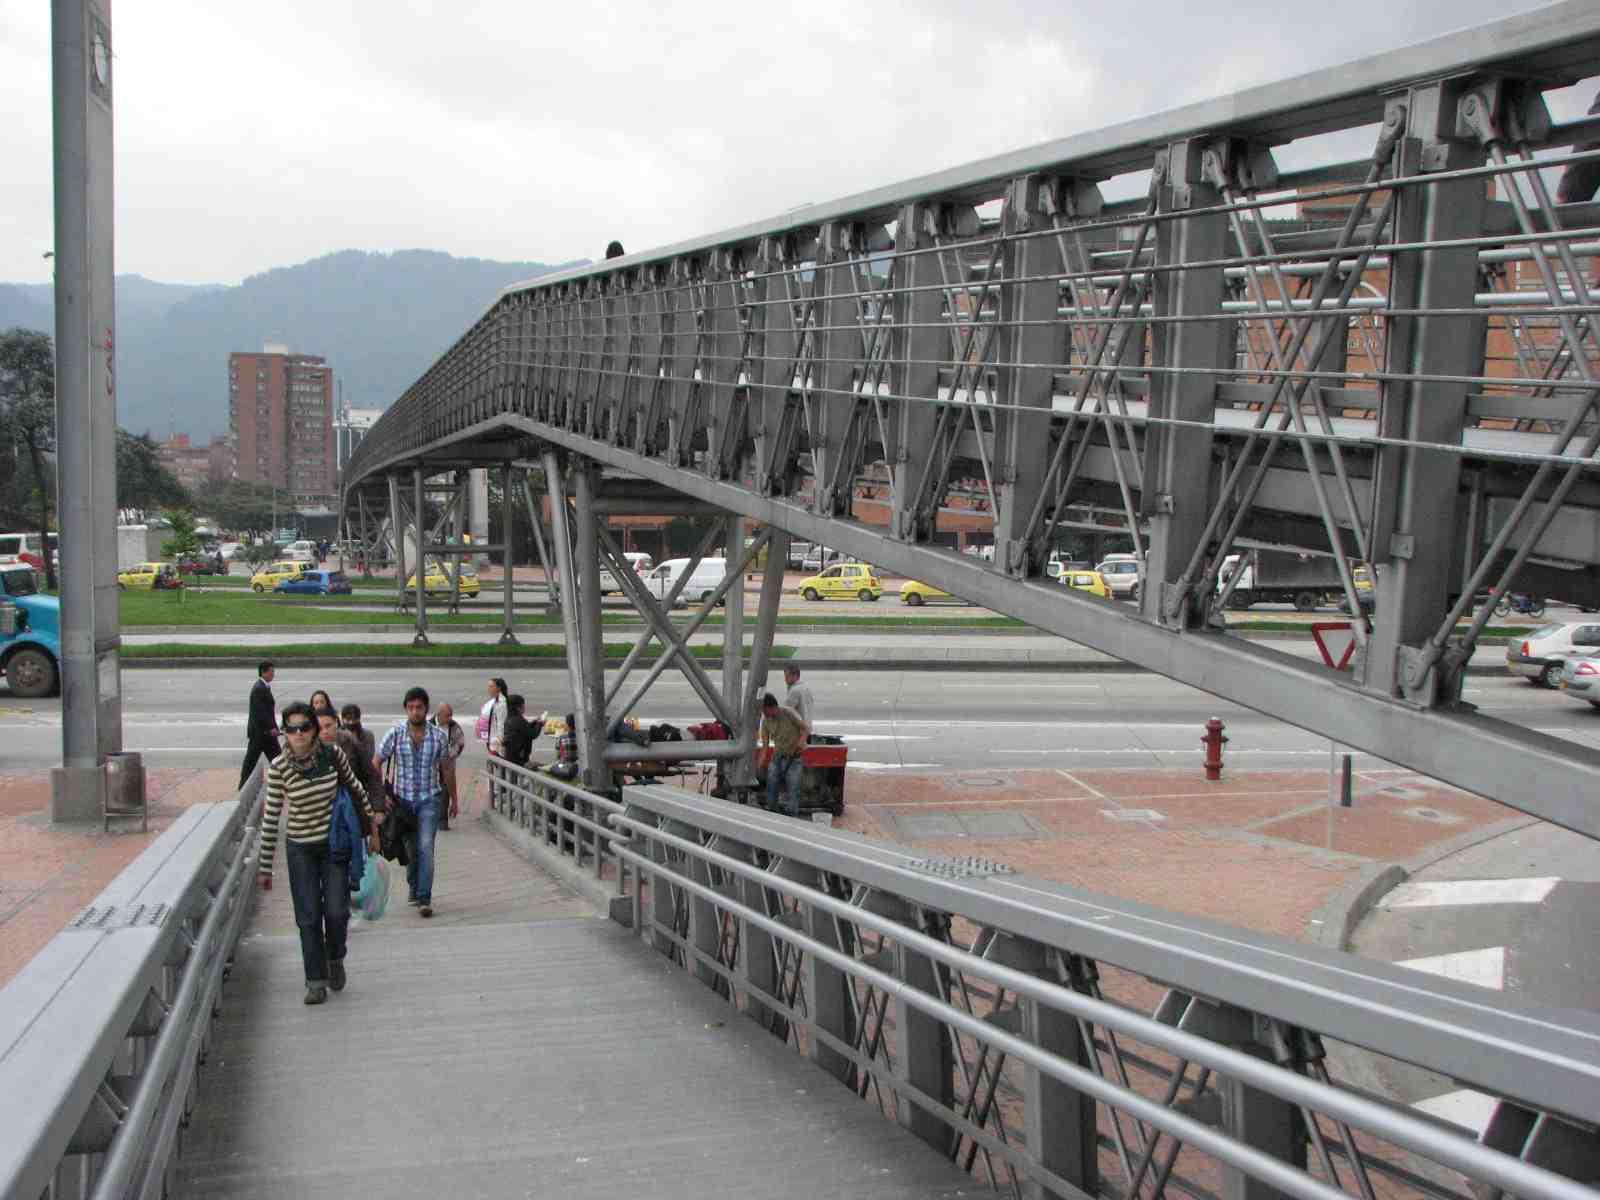 puente peatonal1.JPG